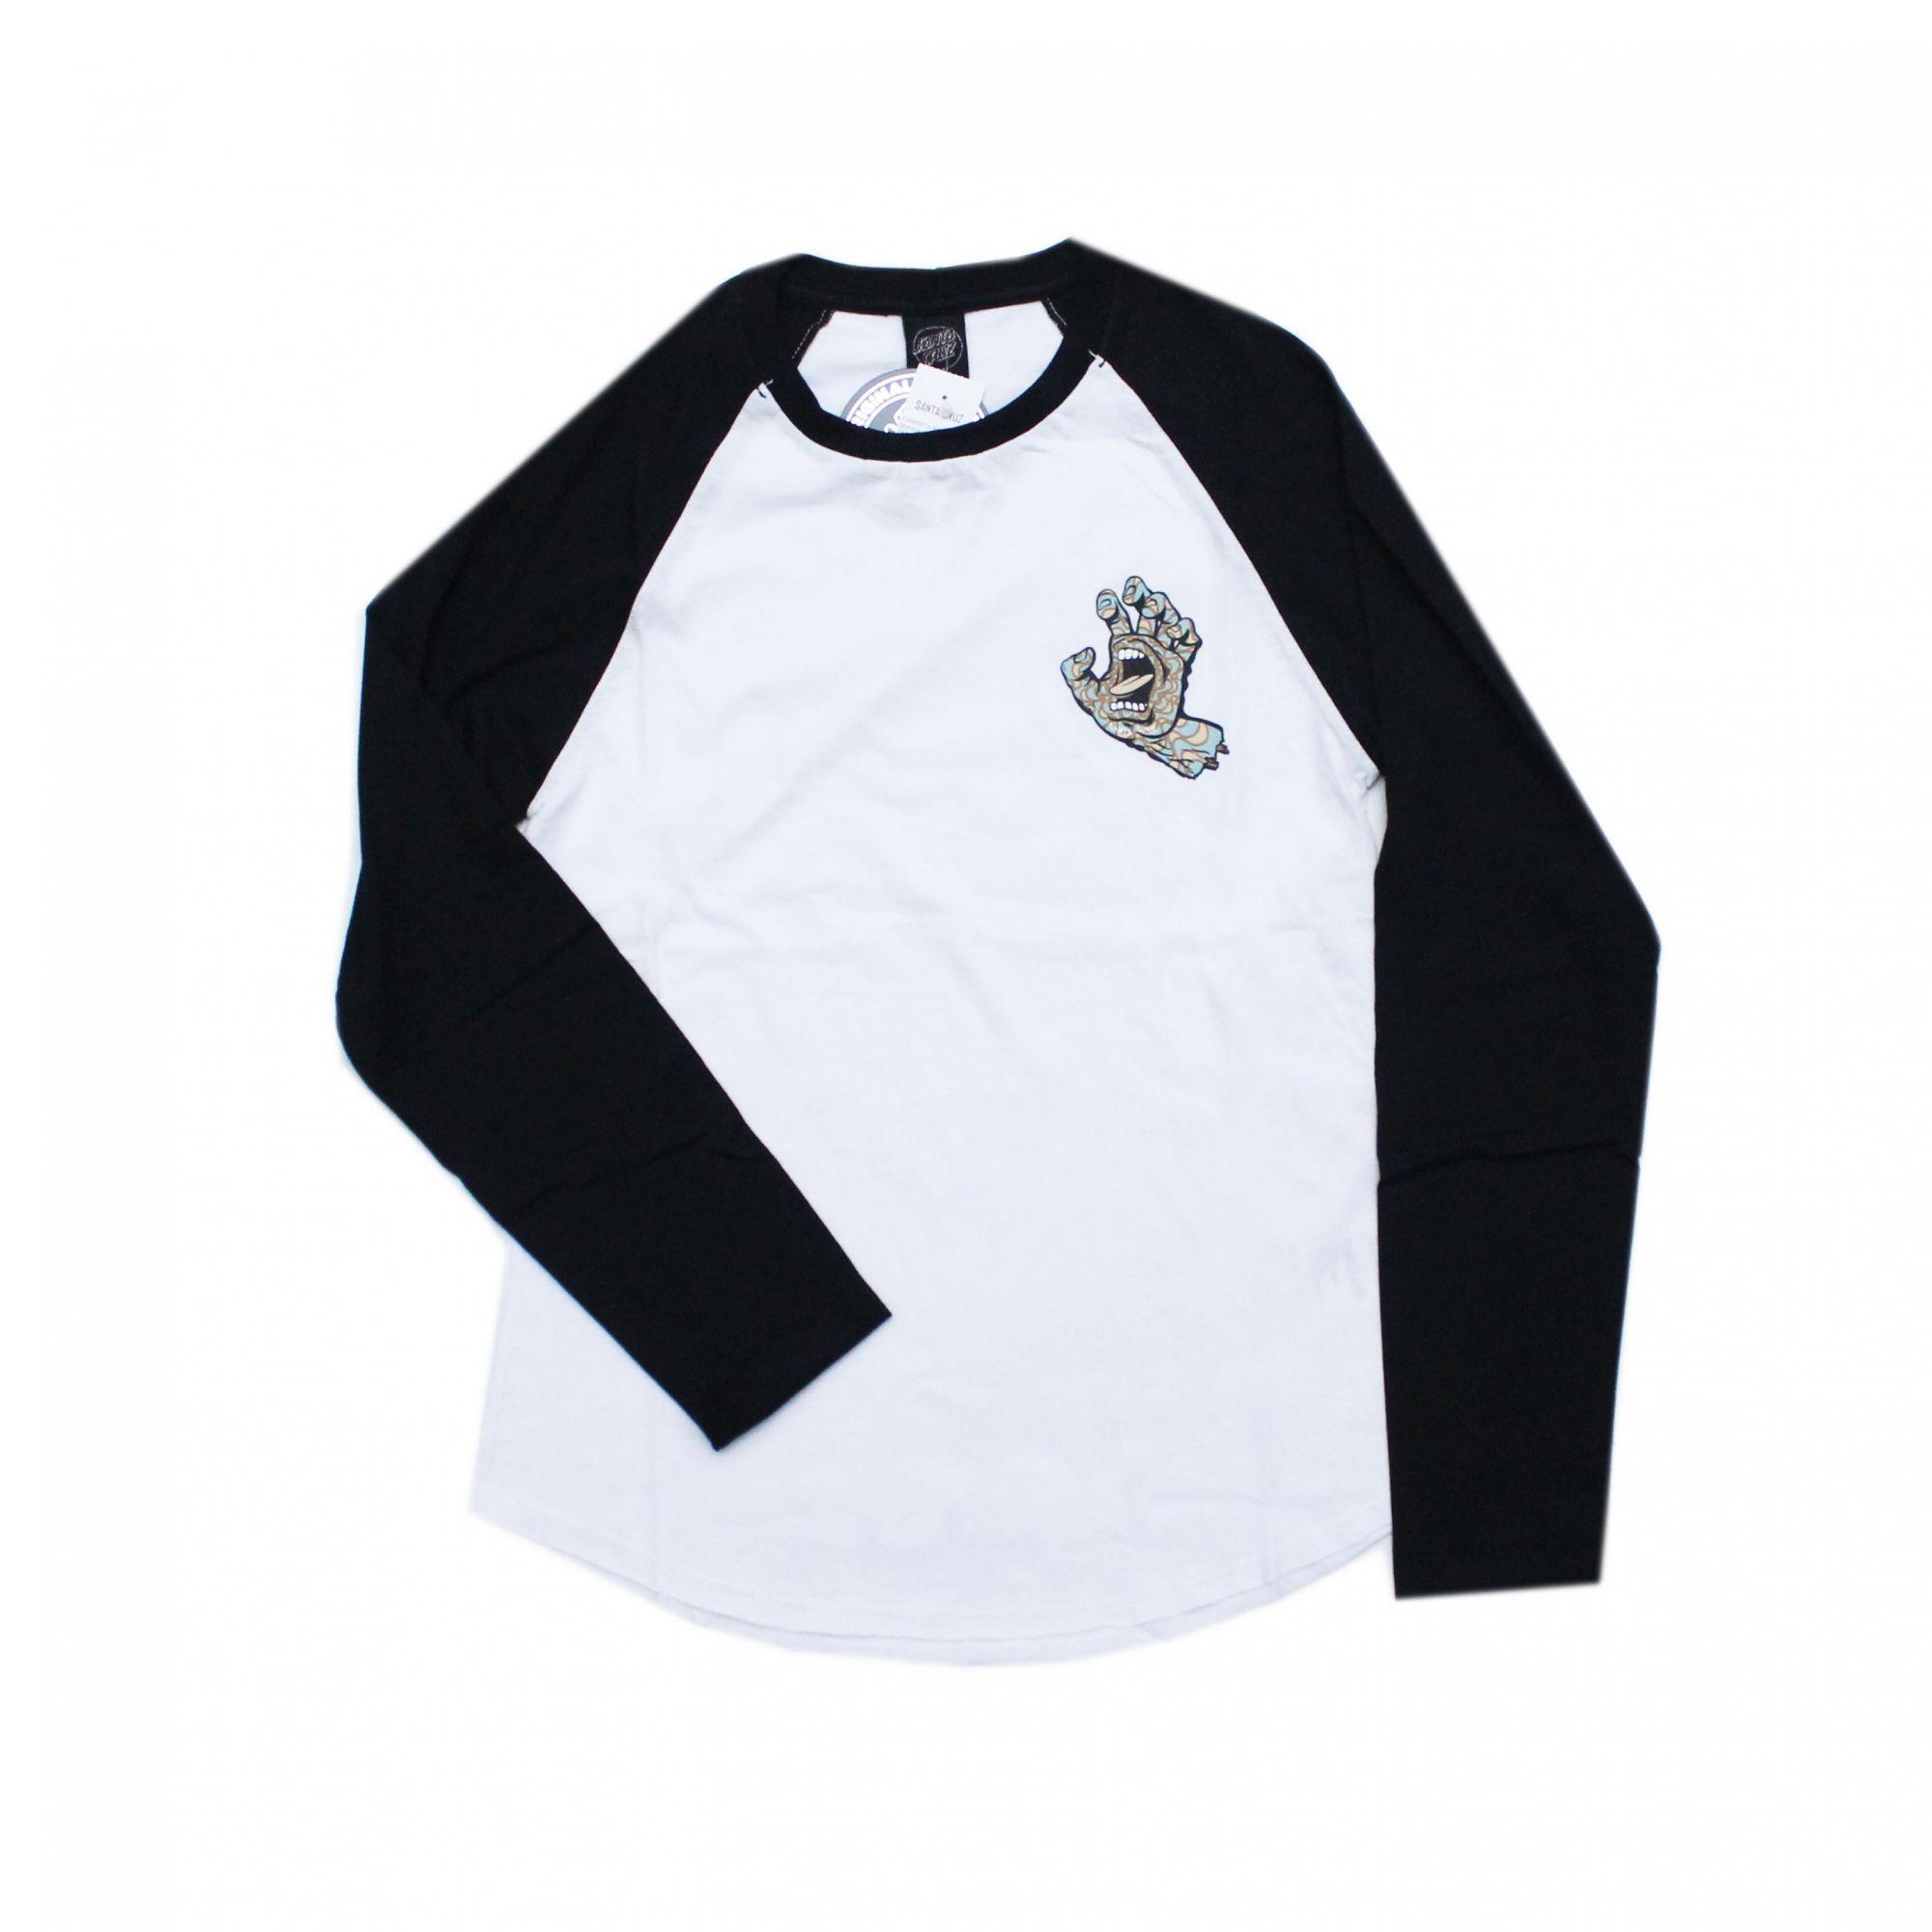 Camiseta Manga Longa Feminina Santa Cruz Raglan Kaleidohand Baseball Branco